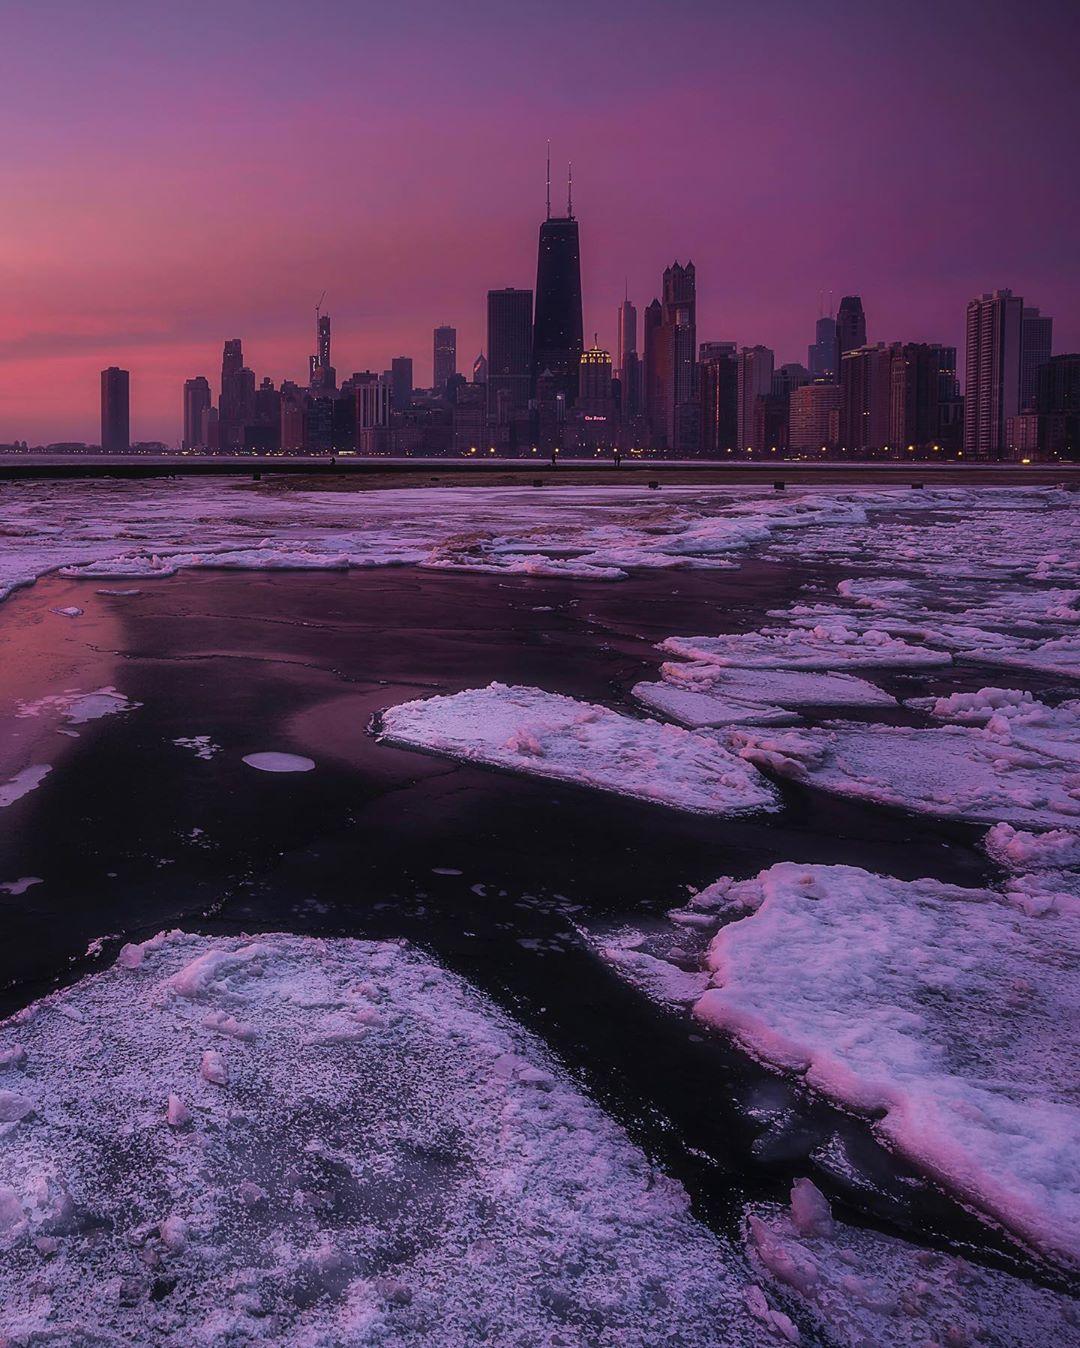 Улицы и архитектура Чикаго на снимках Эрика Марталера